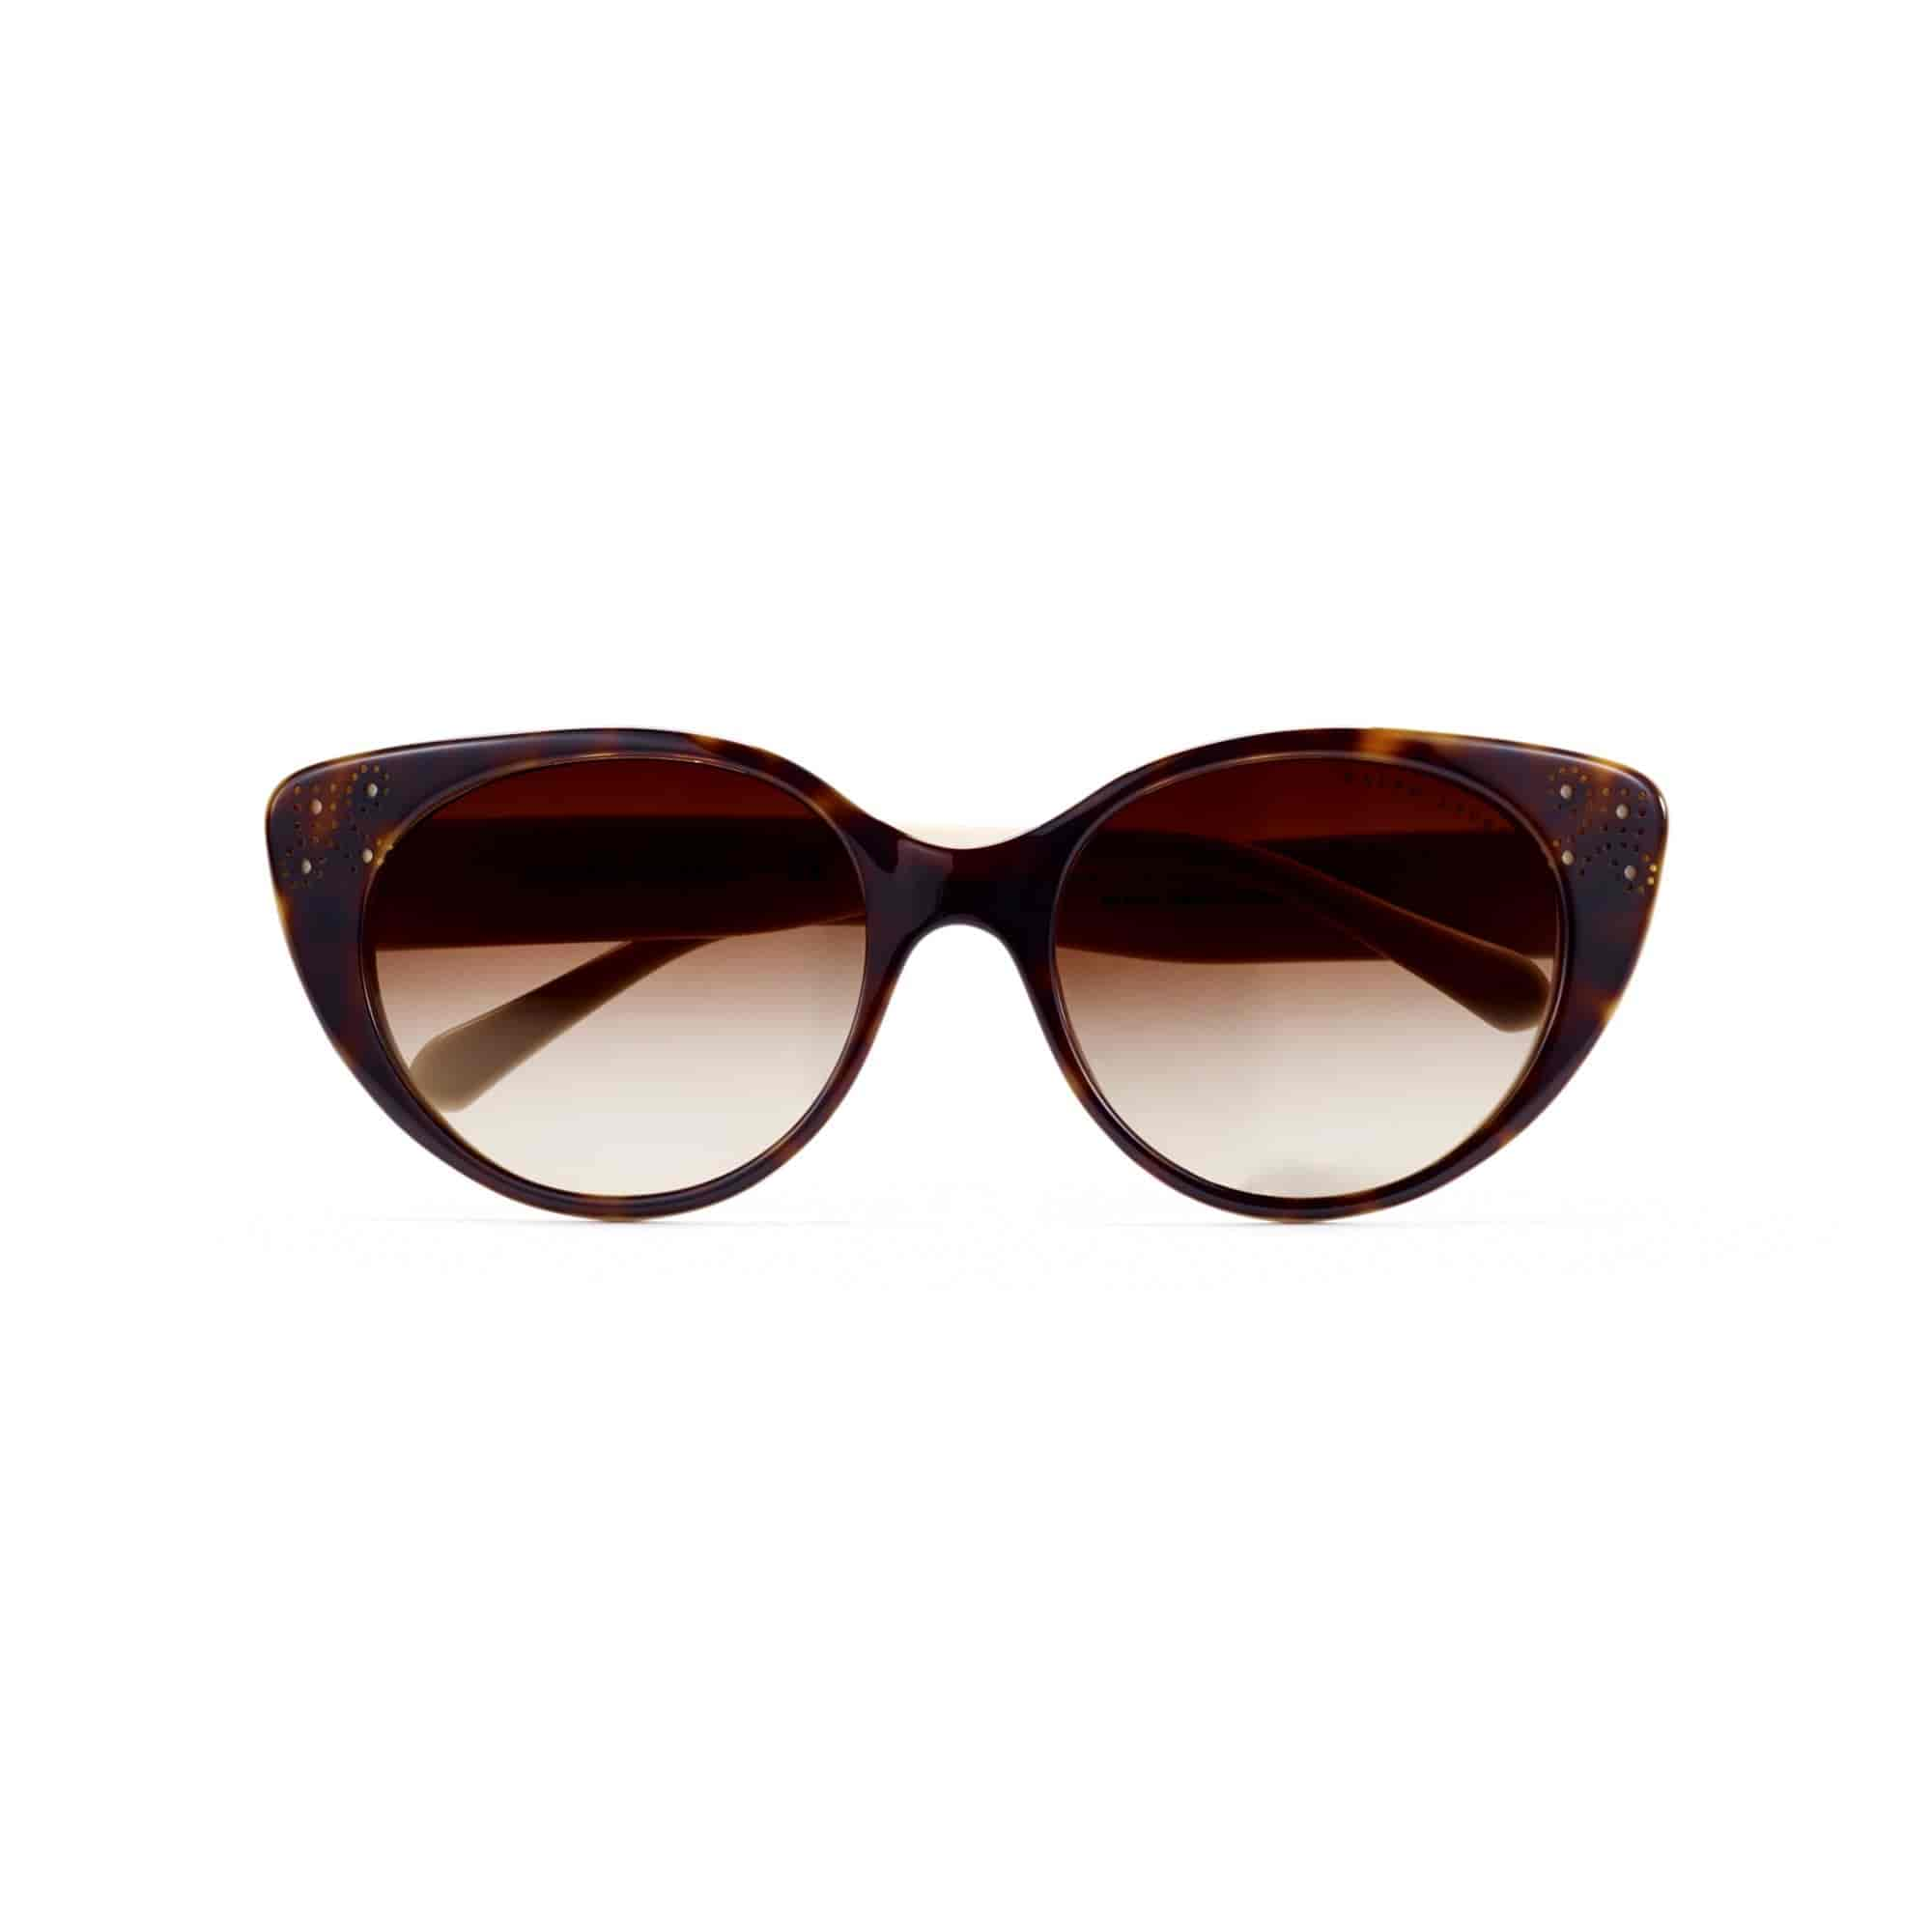 oakley sunglasses price in india f3qn  Ralph Lauren Cat Eye Spectator Women Sunglasses Havana [30873926]